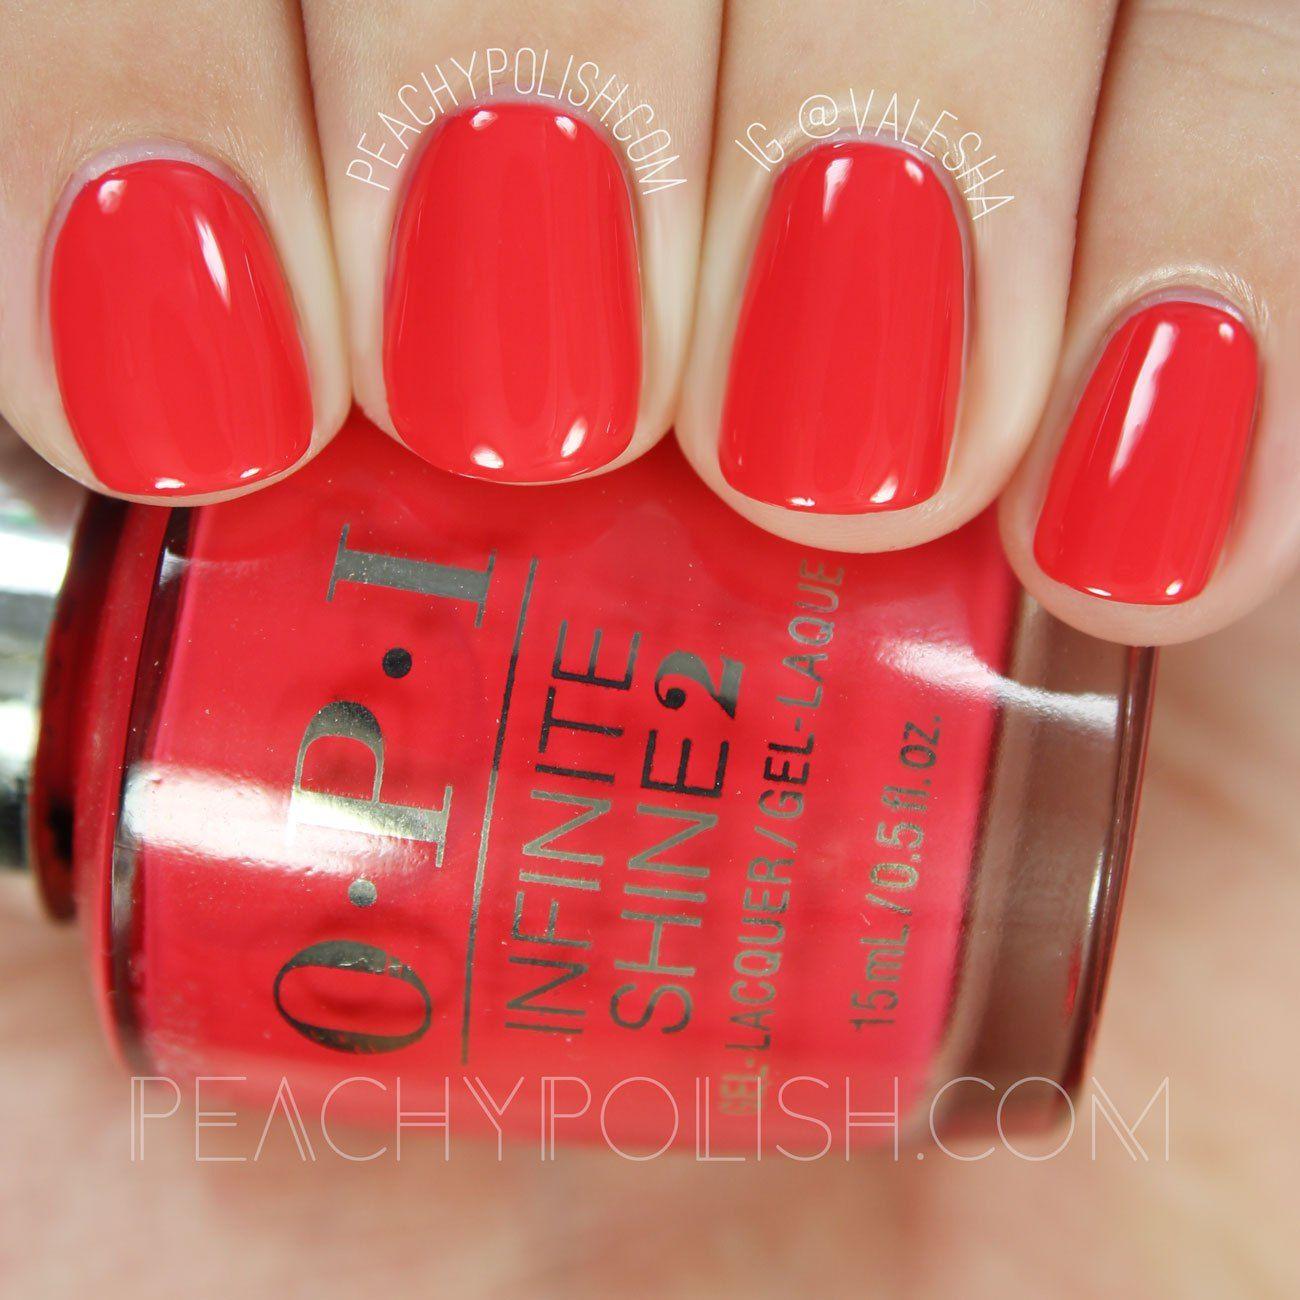 Nails Quenalbertini Opi Cajun Shrimp Infinite Shine Iconic Collection Peachy Polish